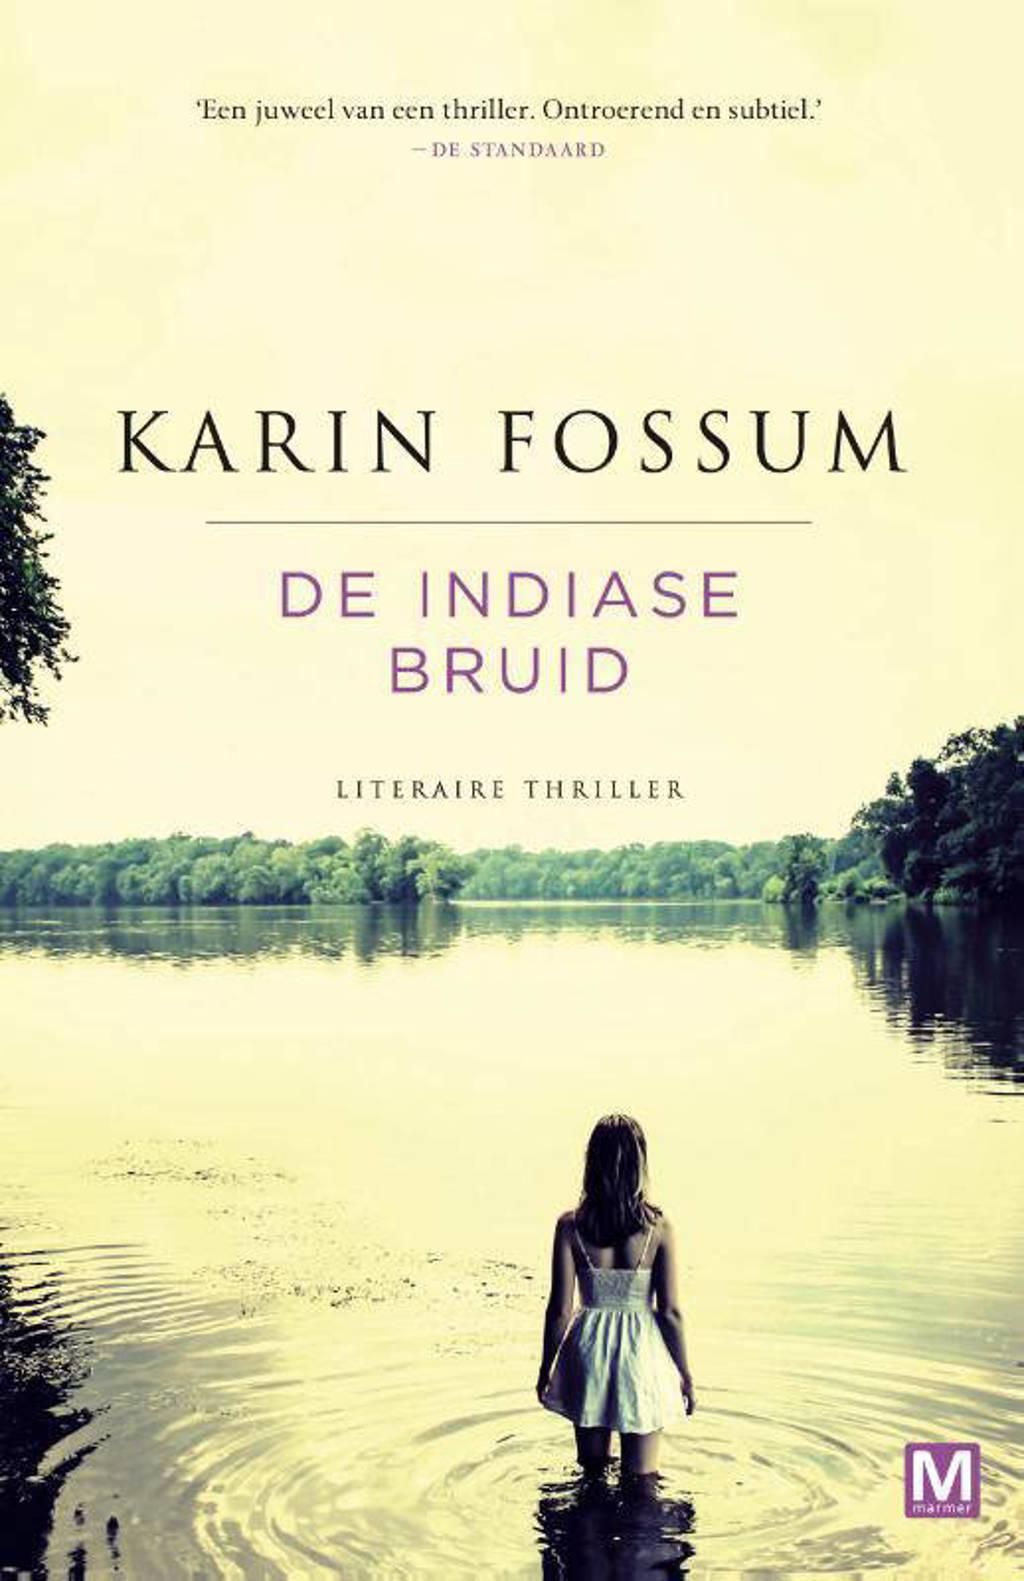 De Indiase bruid - Karin Fossum